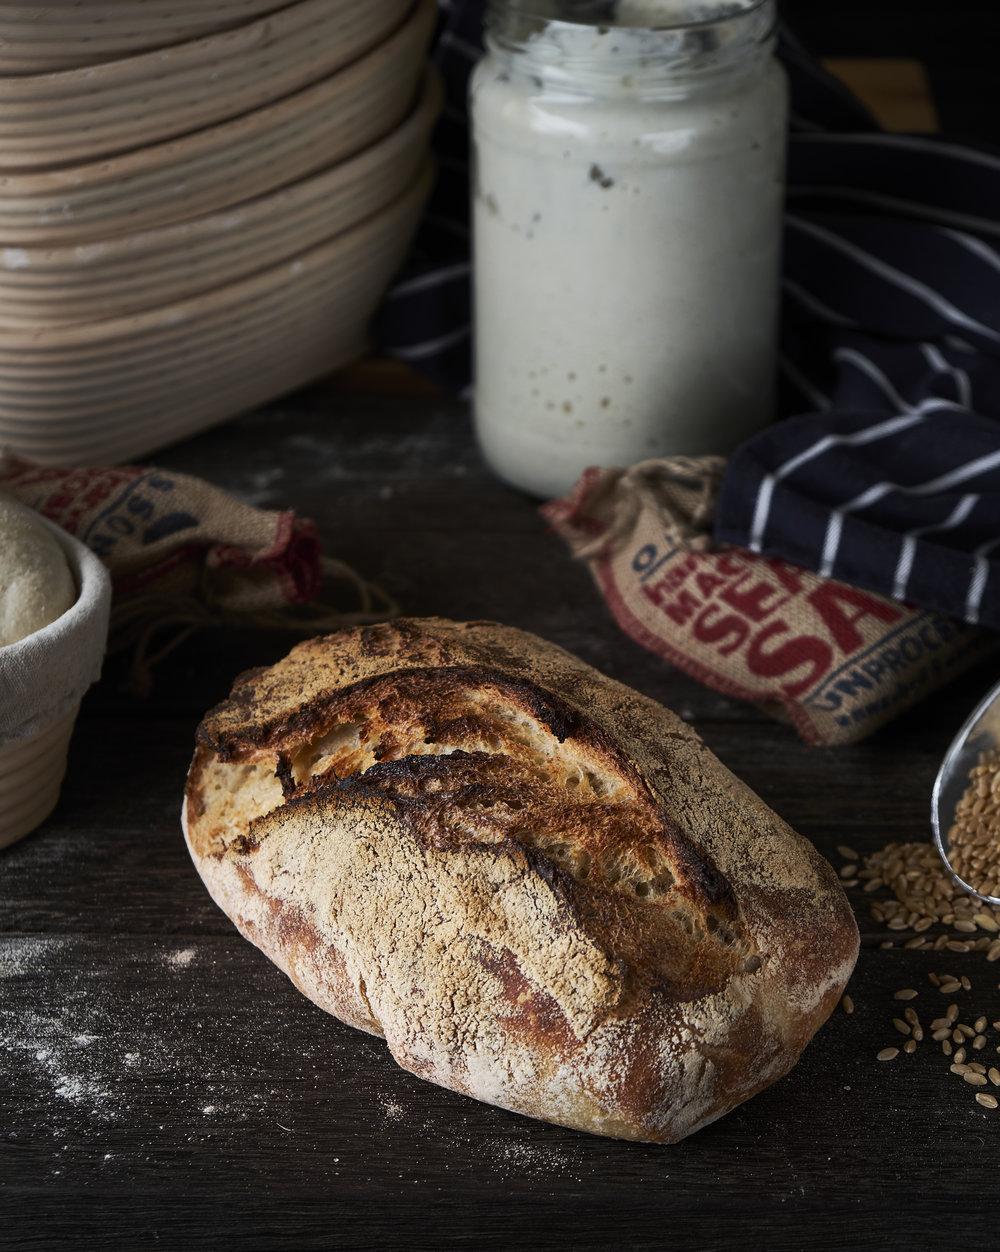 Bred_0190_Bread scene_A.jpg